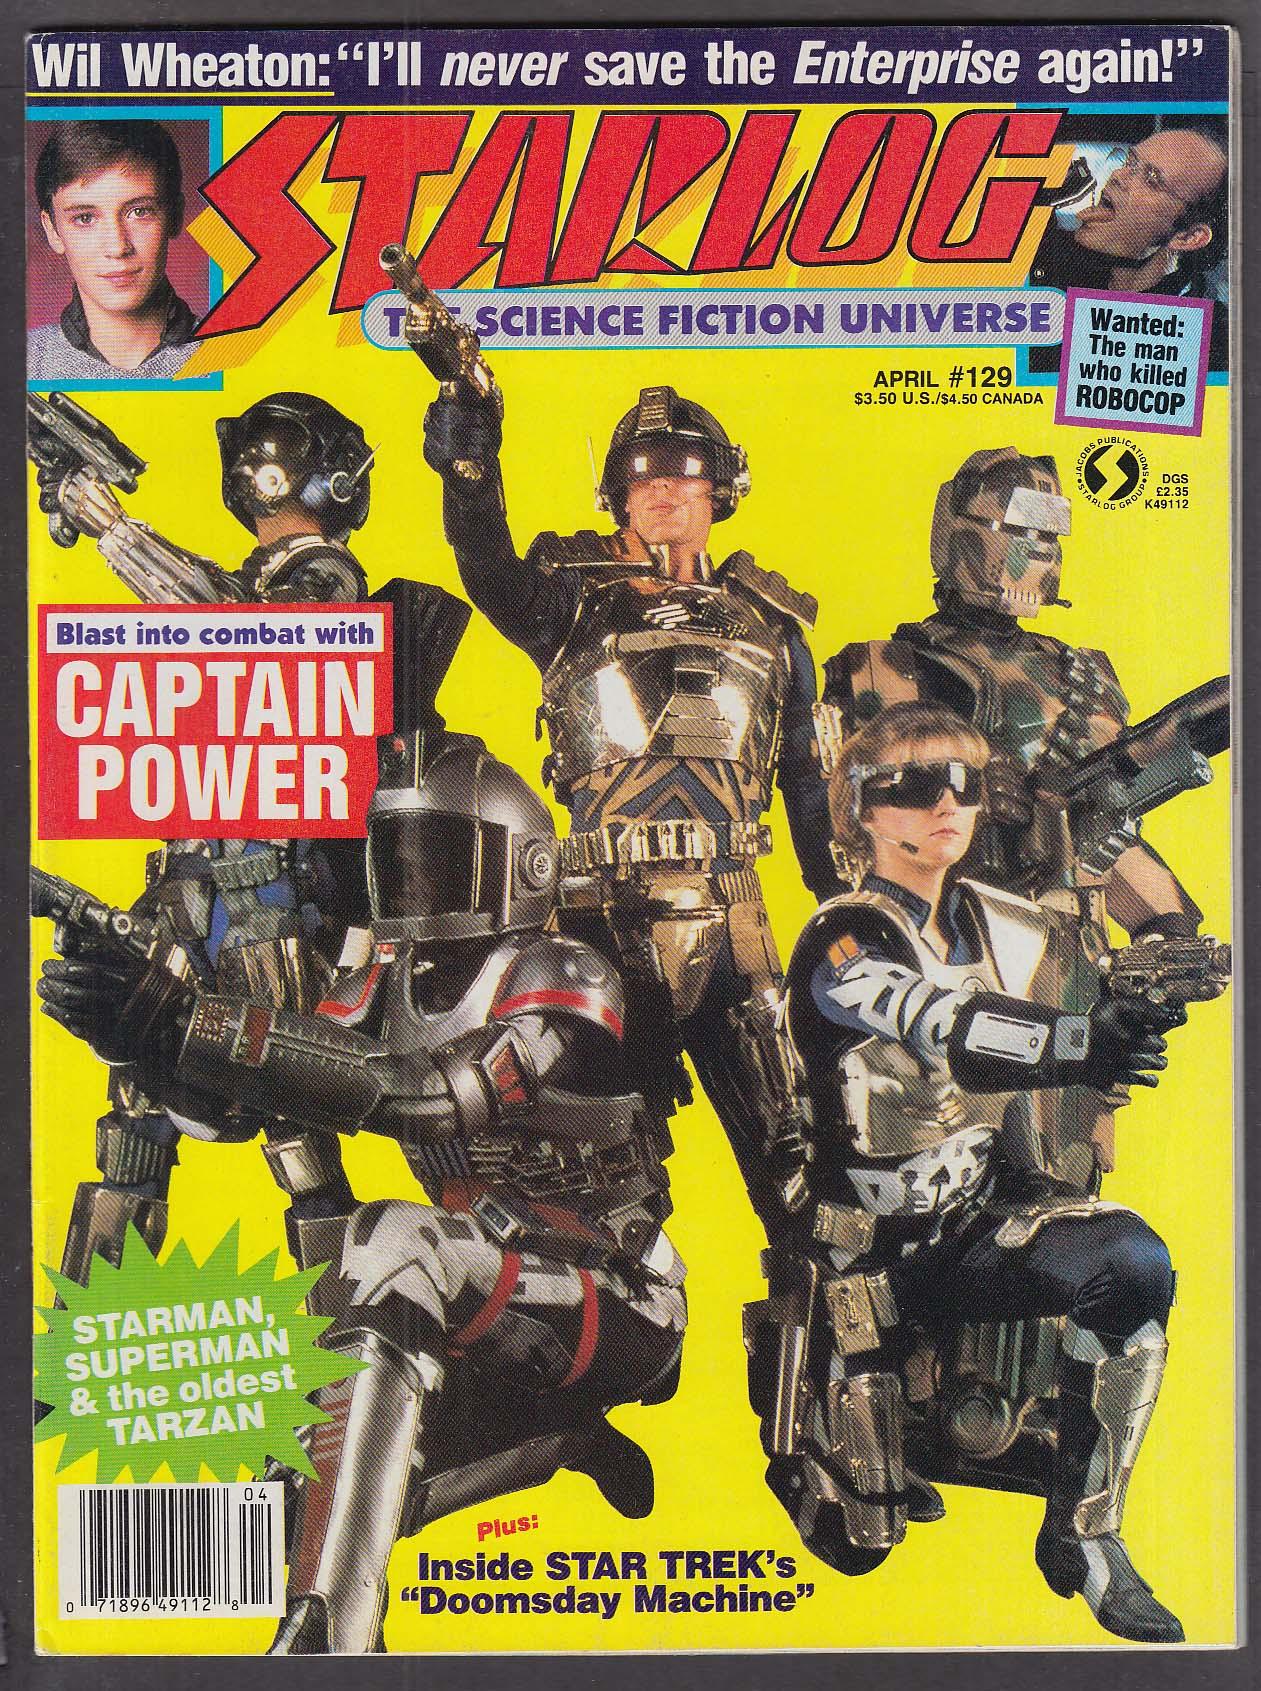 STARLOG #129 Captain Power Wil Wheaton Robocop Star Trek Superman Tarzan 4 1988